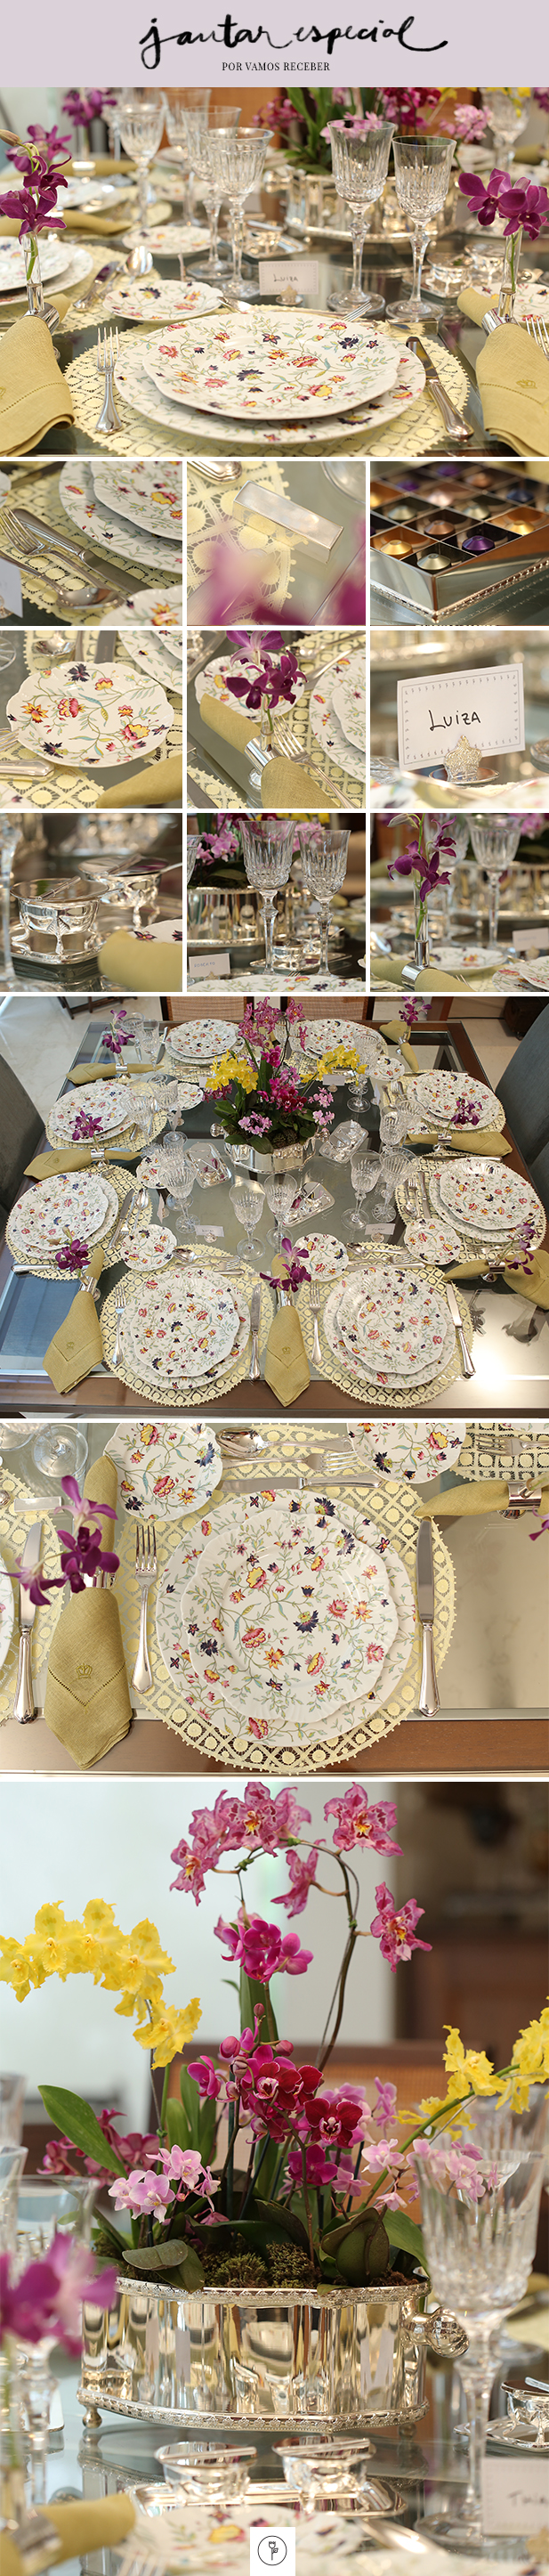 lista tb - fleur royal - jantar especial